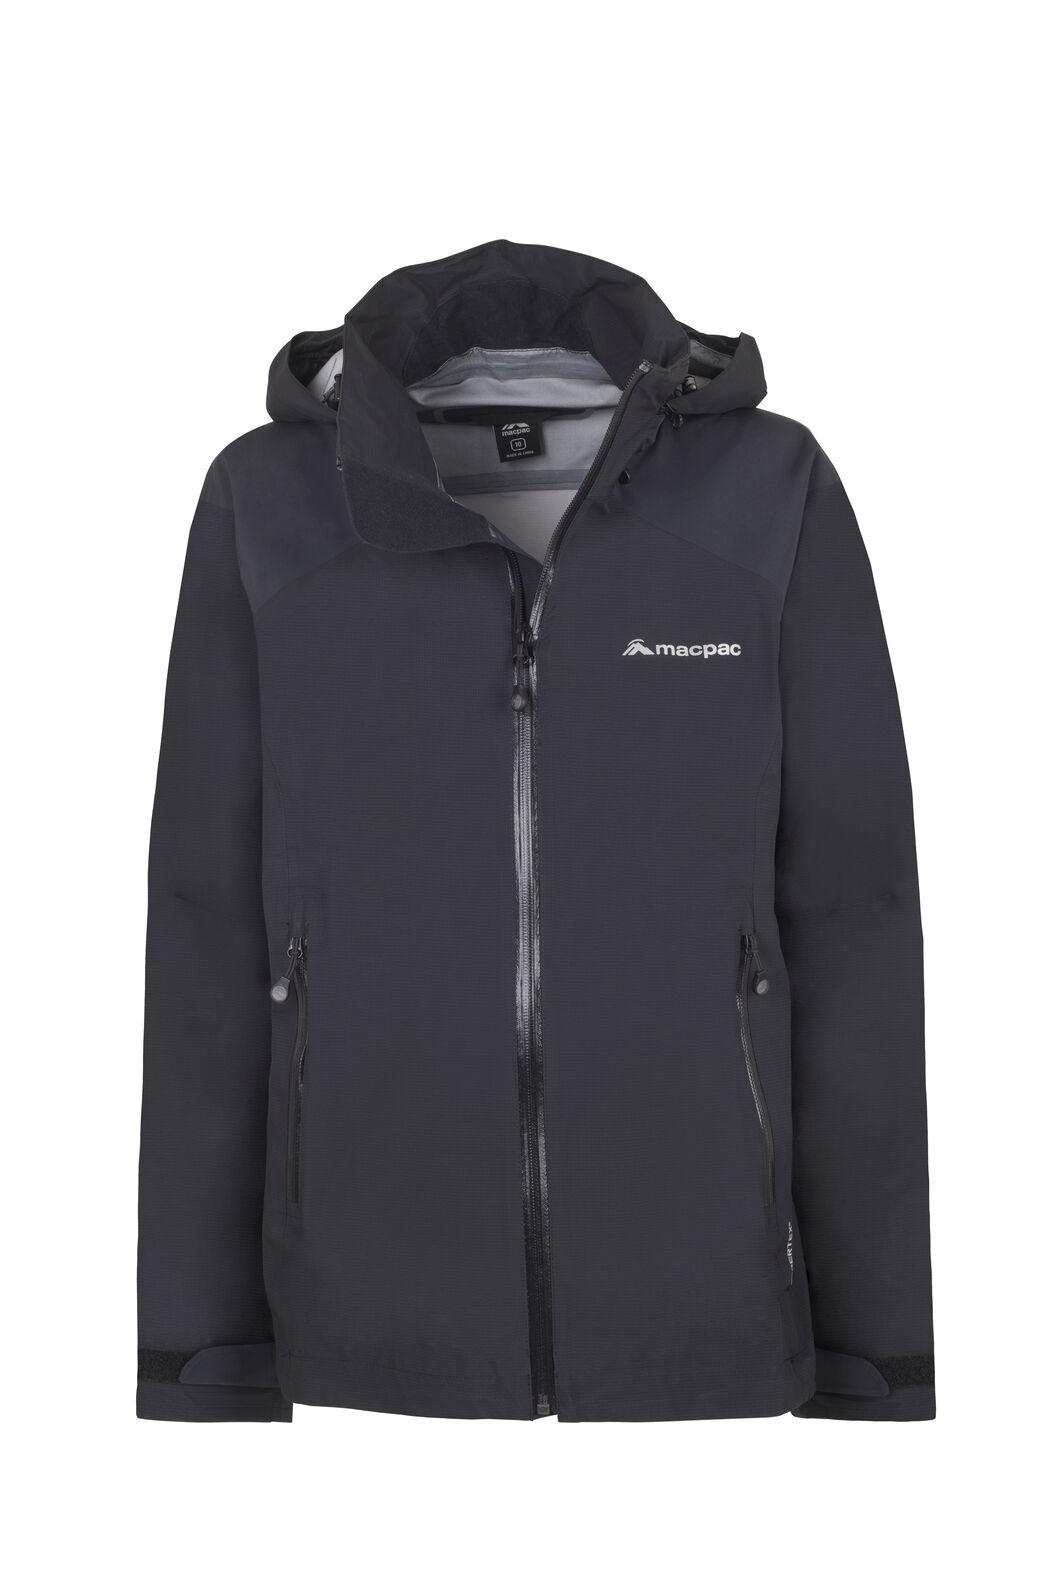 Macpac Traverse Pertex® Rain Jacket - Women's, Black, hi-res